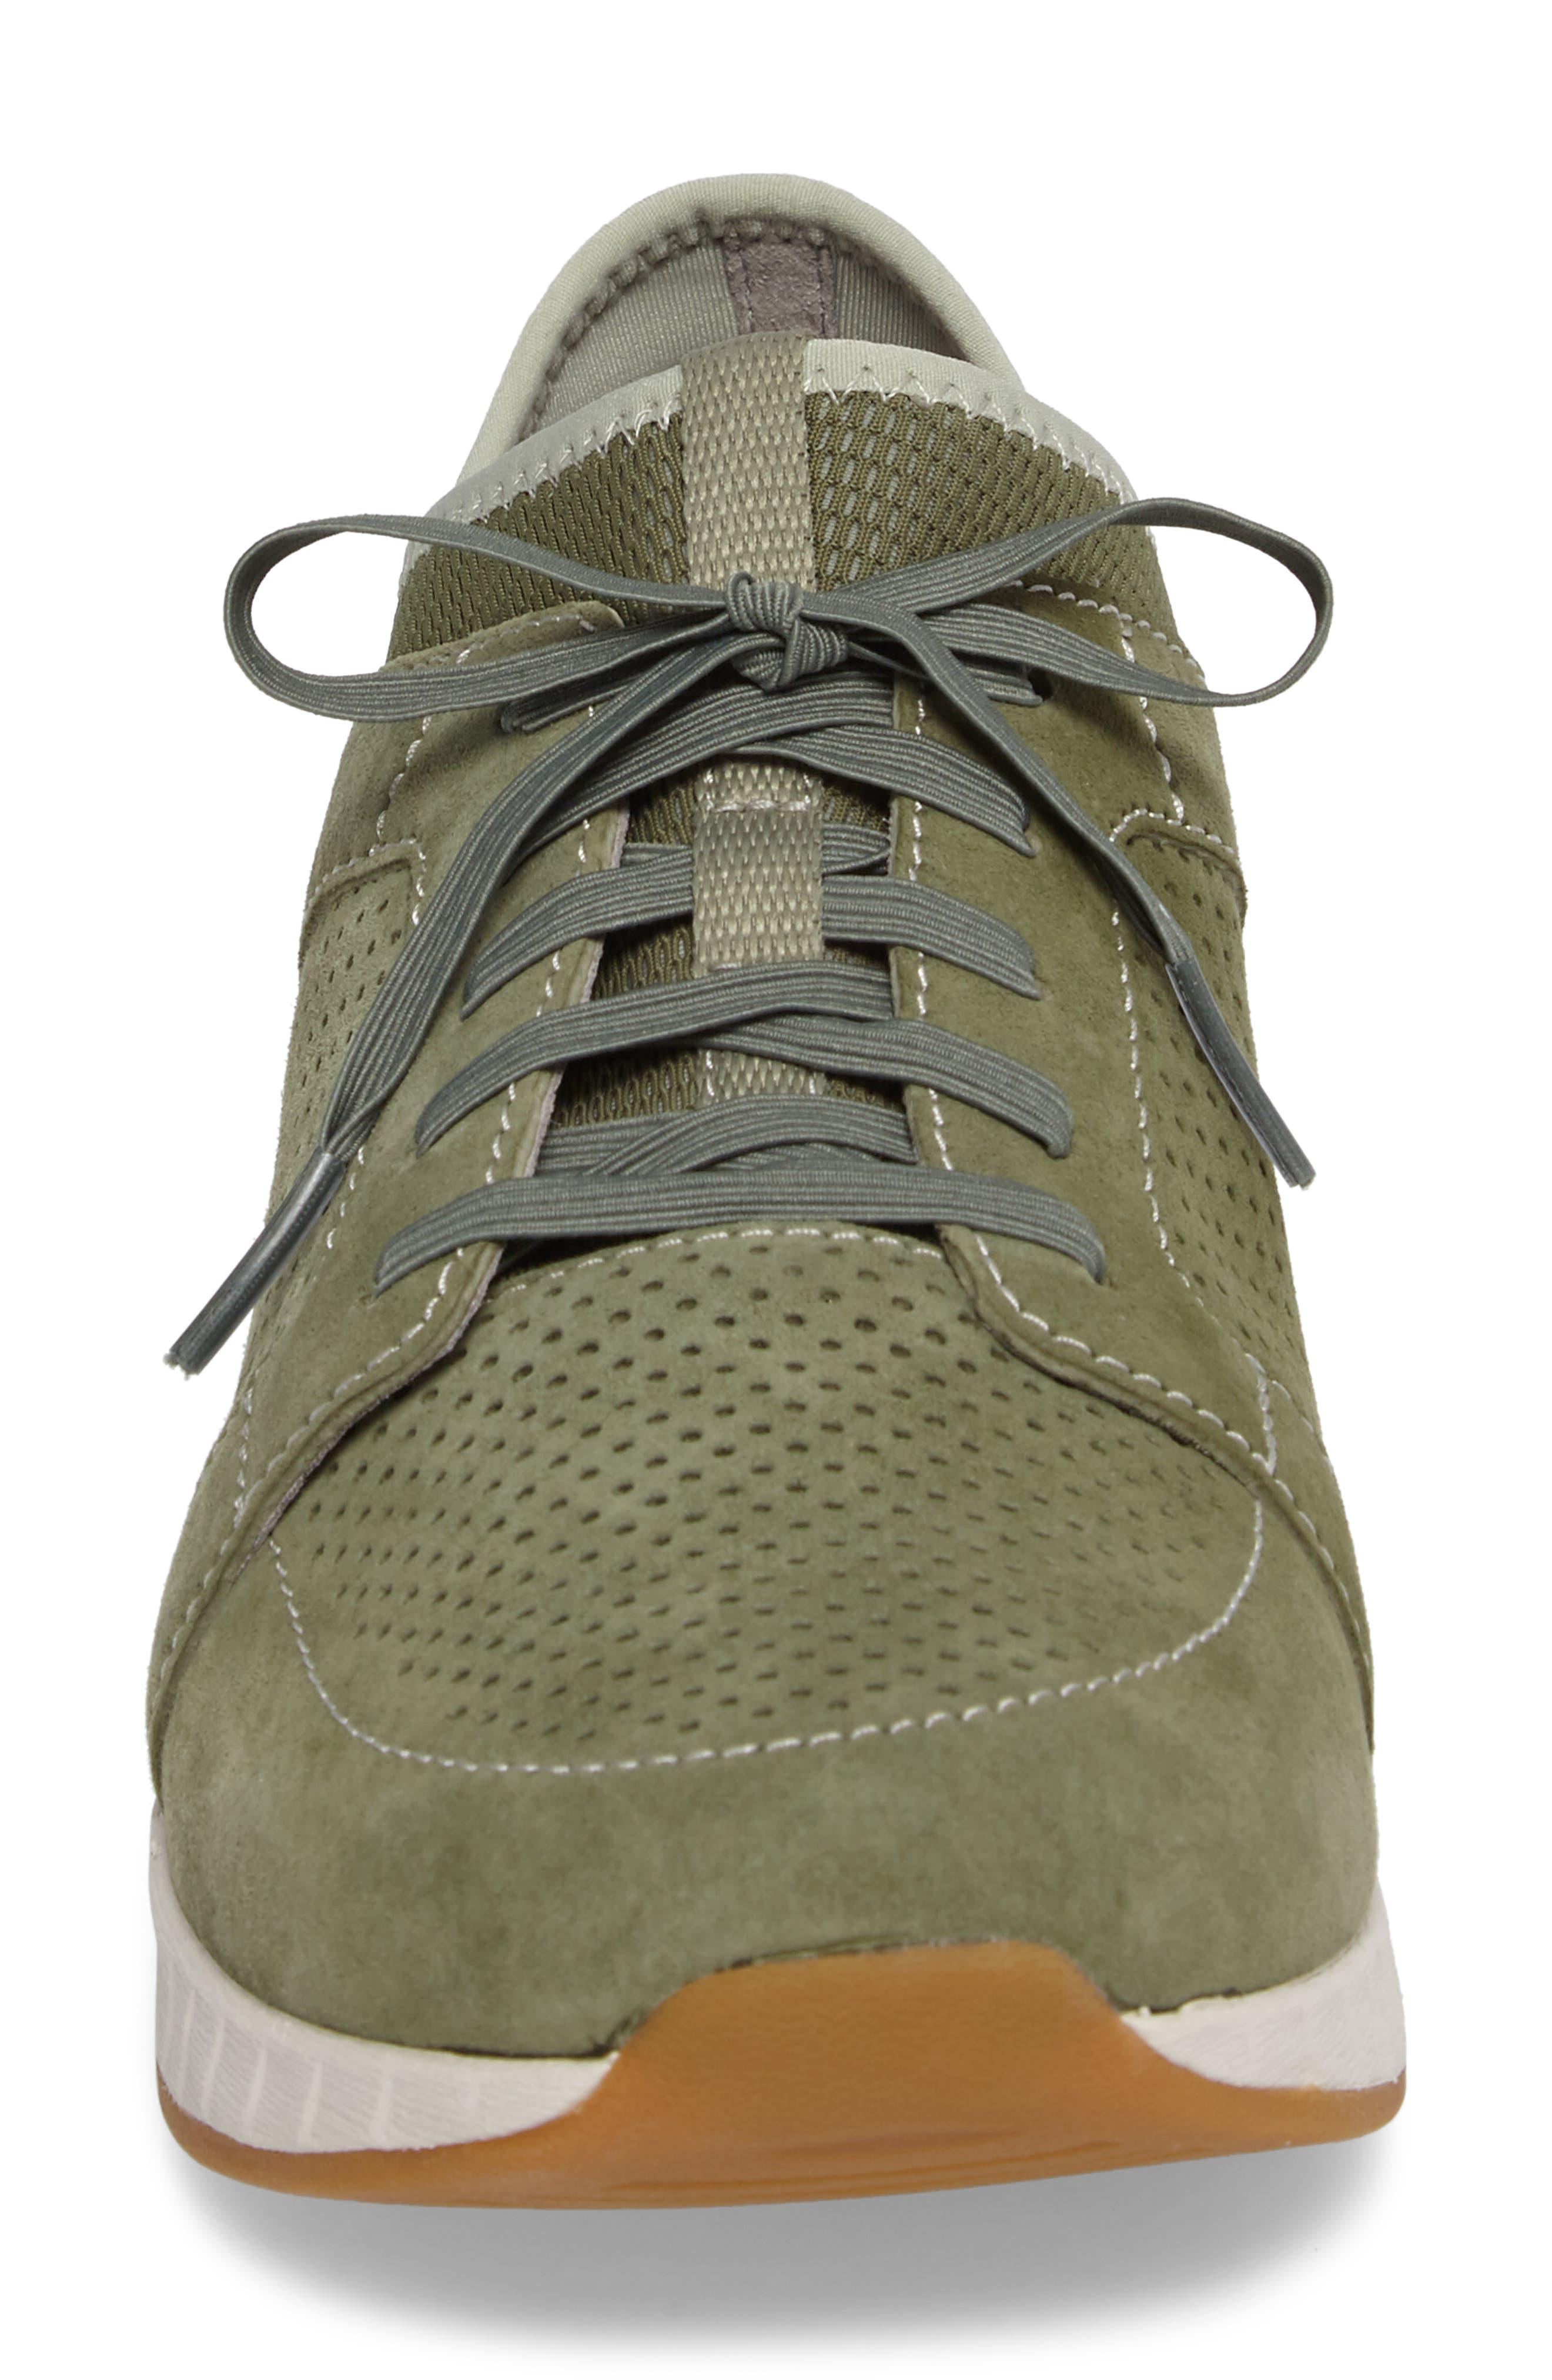 Cozette Slip-On Sneaker,                             Alternate thumbnail 4, color,                             Sage Suede